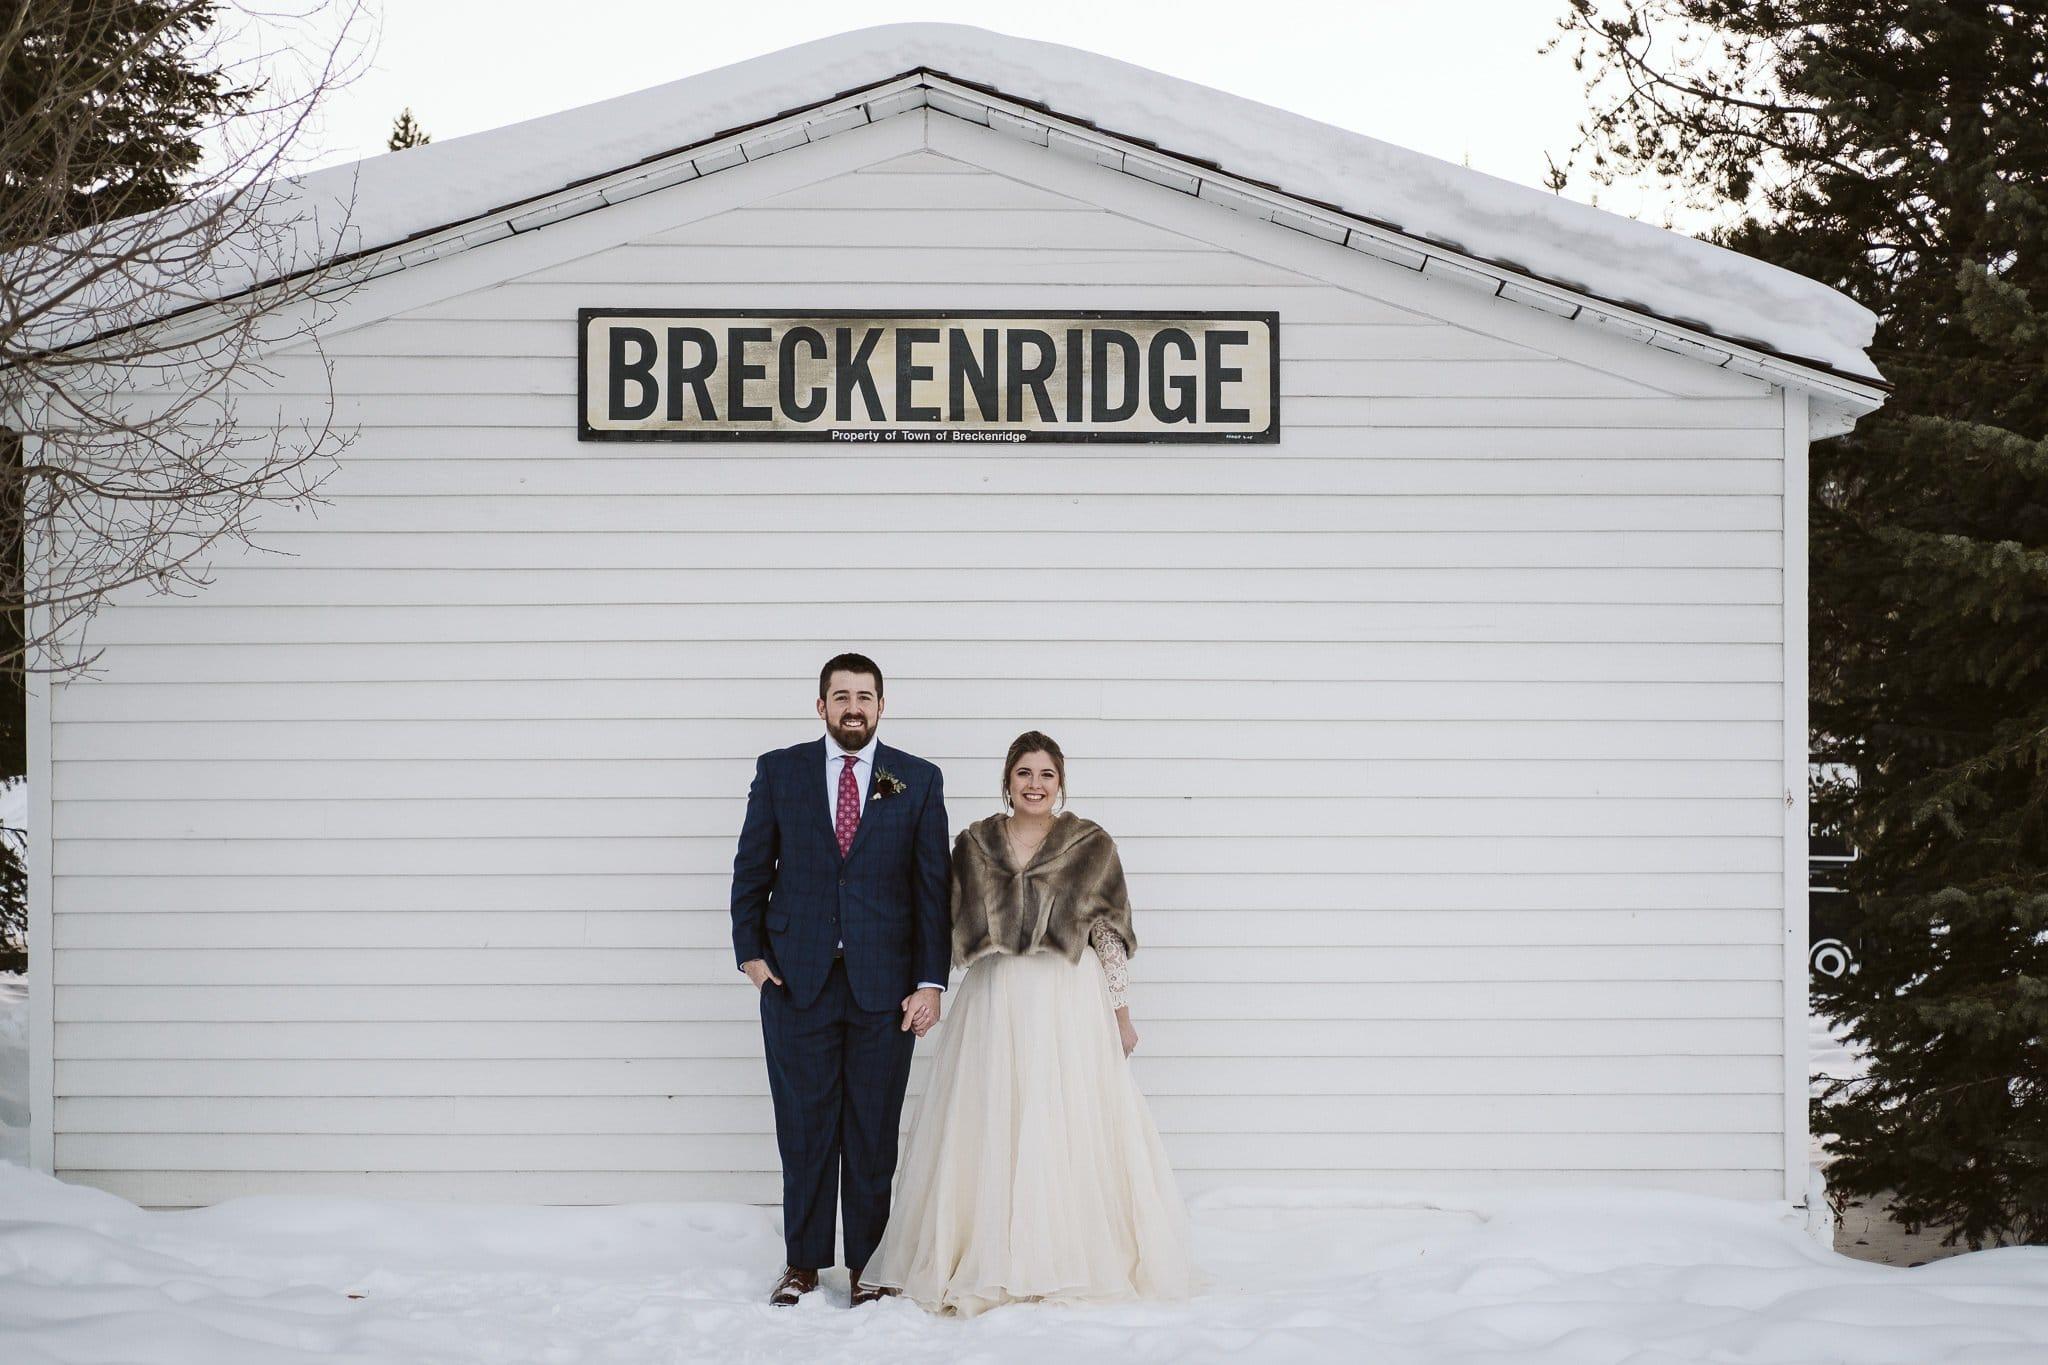 Breckenridge winter wedding photos.